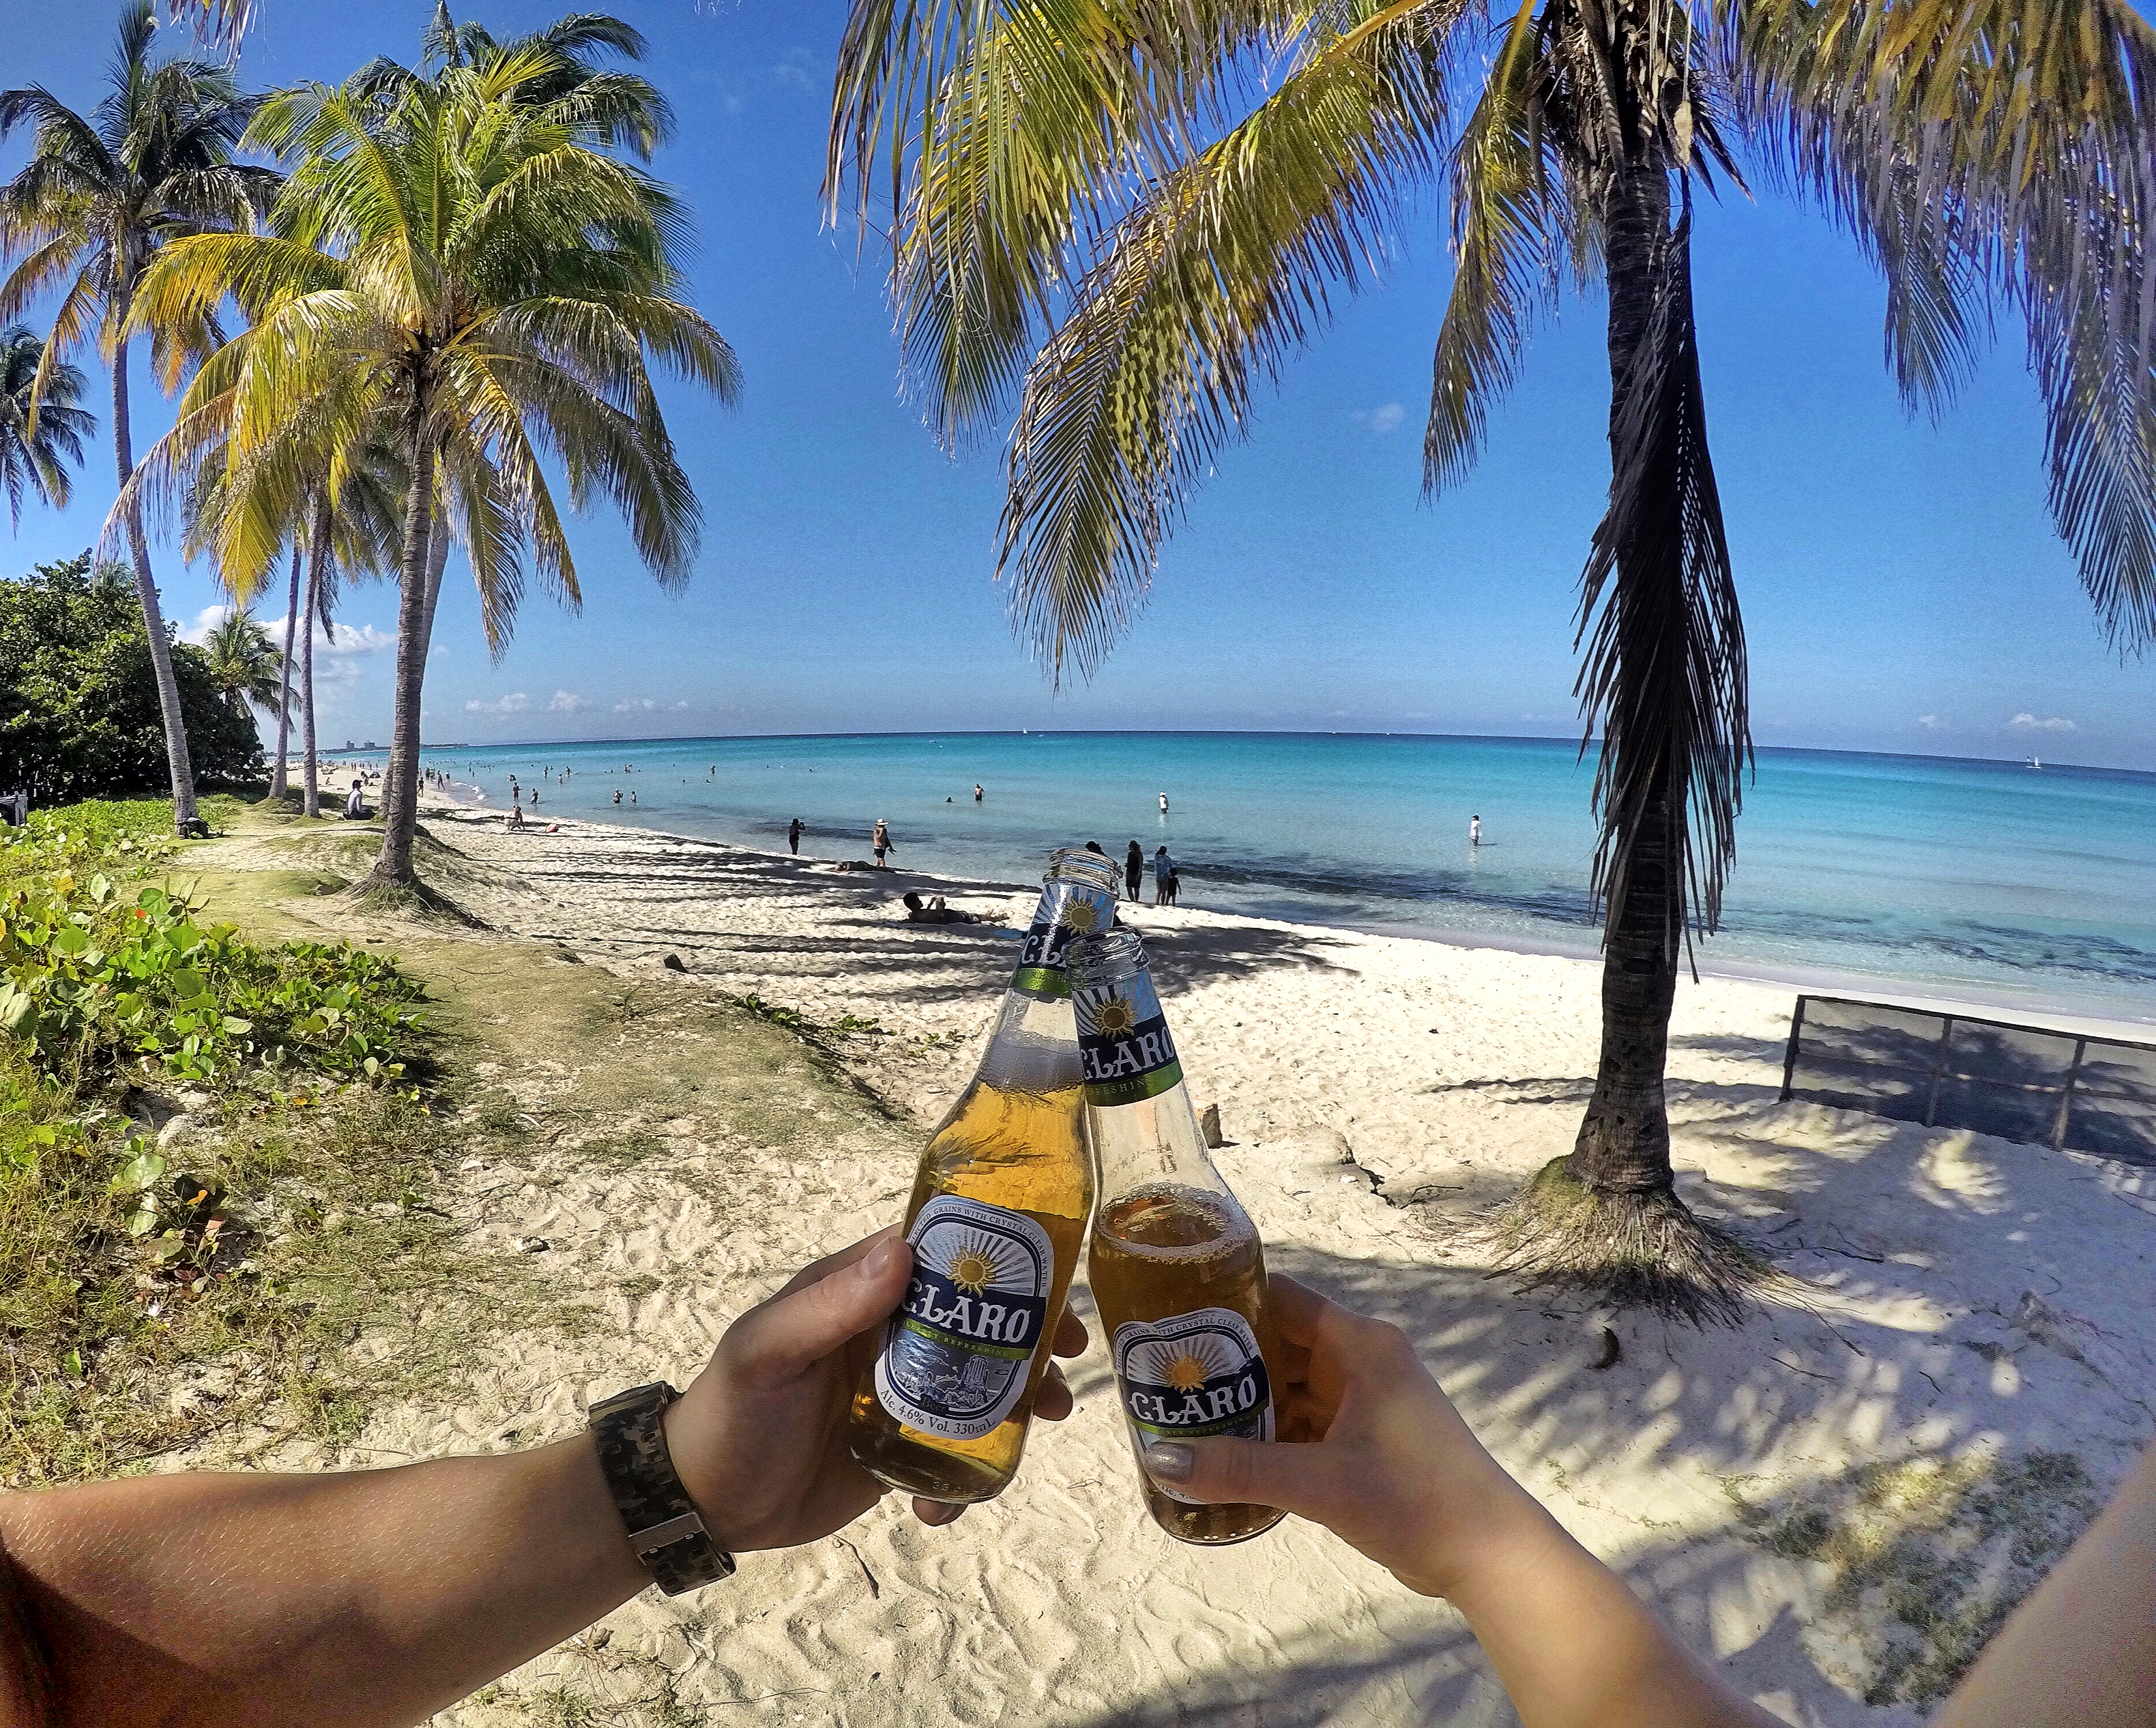 cheers-beer-cerveza-claro-beach-playa-paradise-varadero